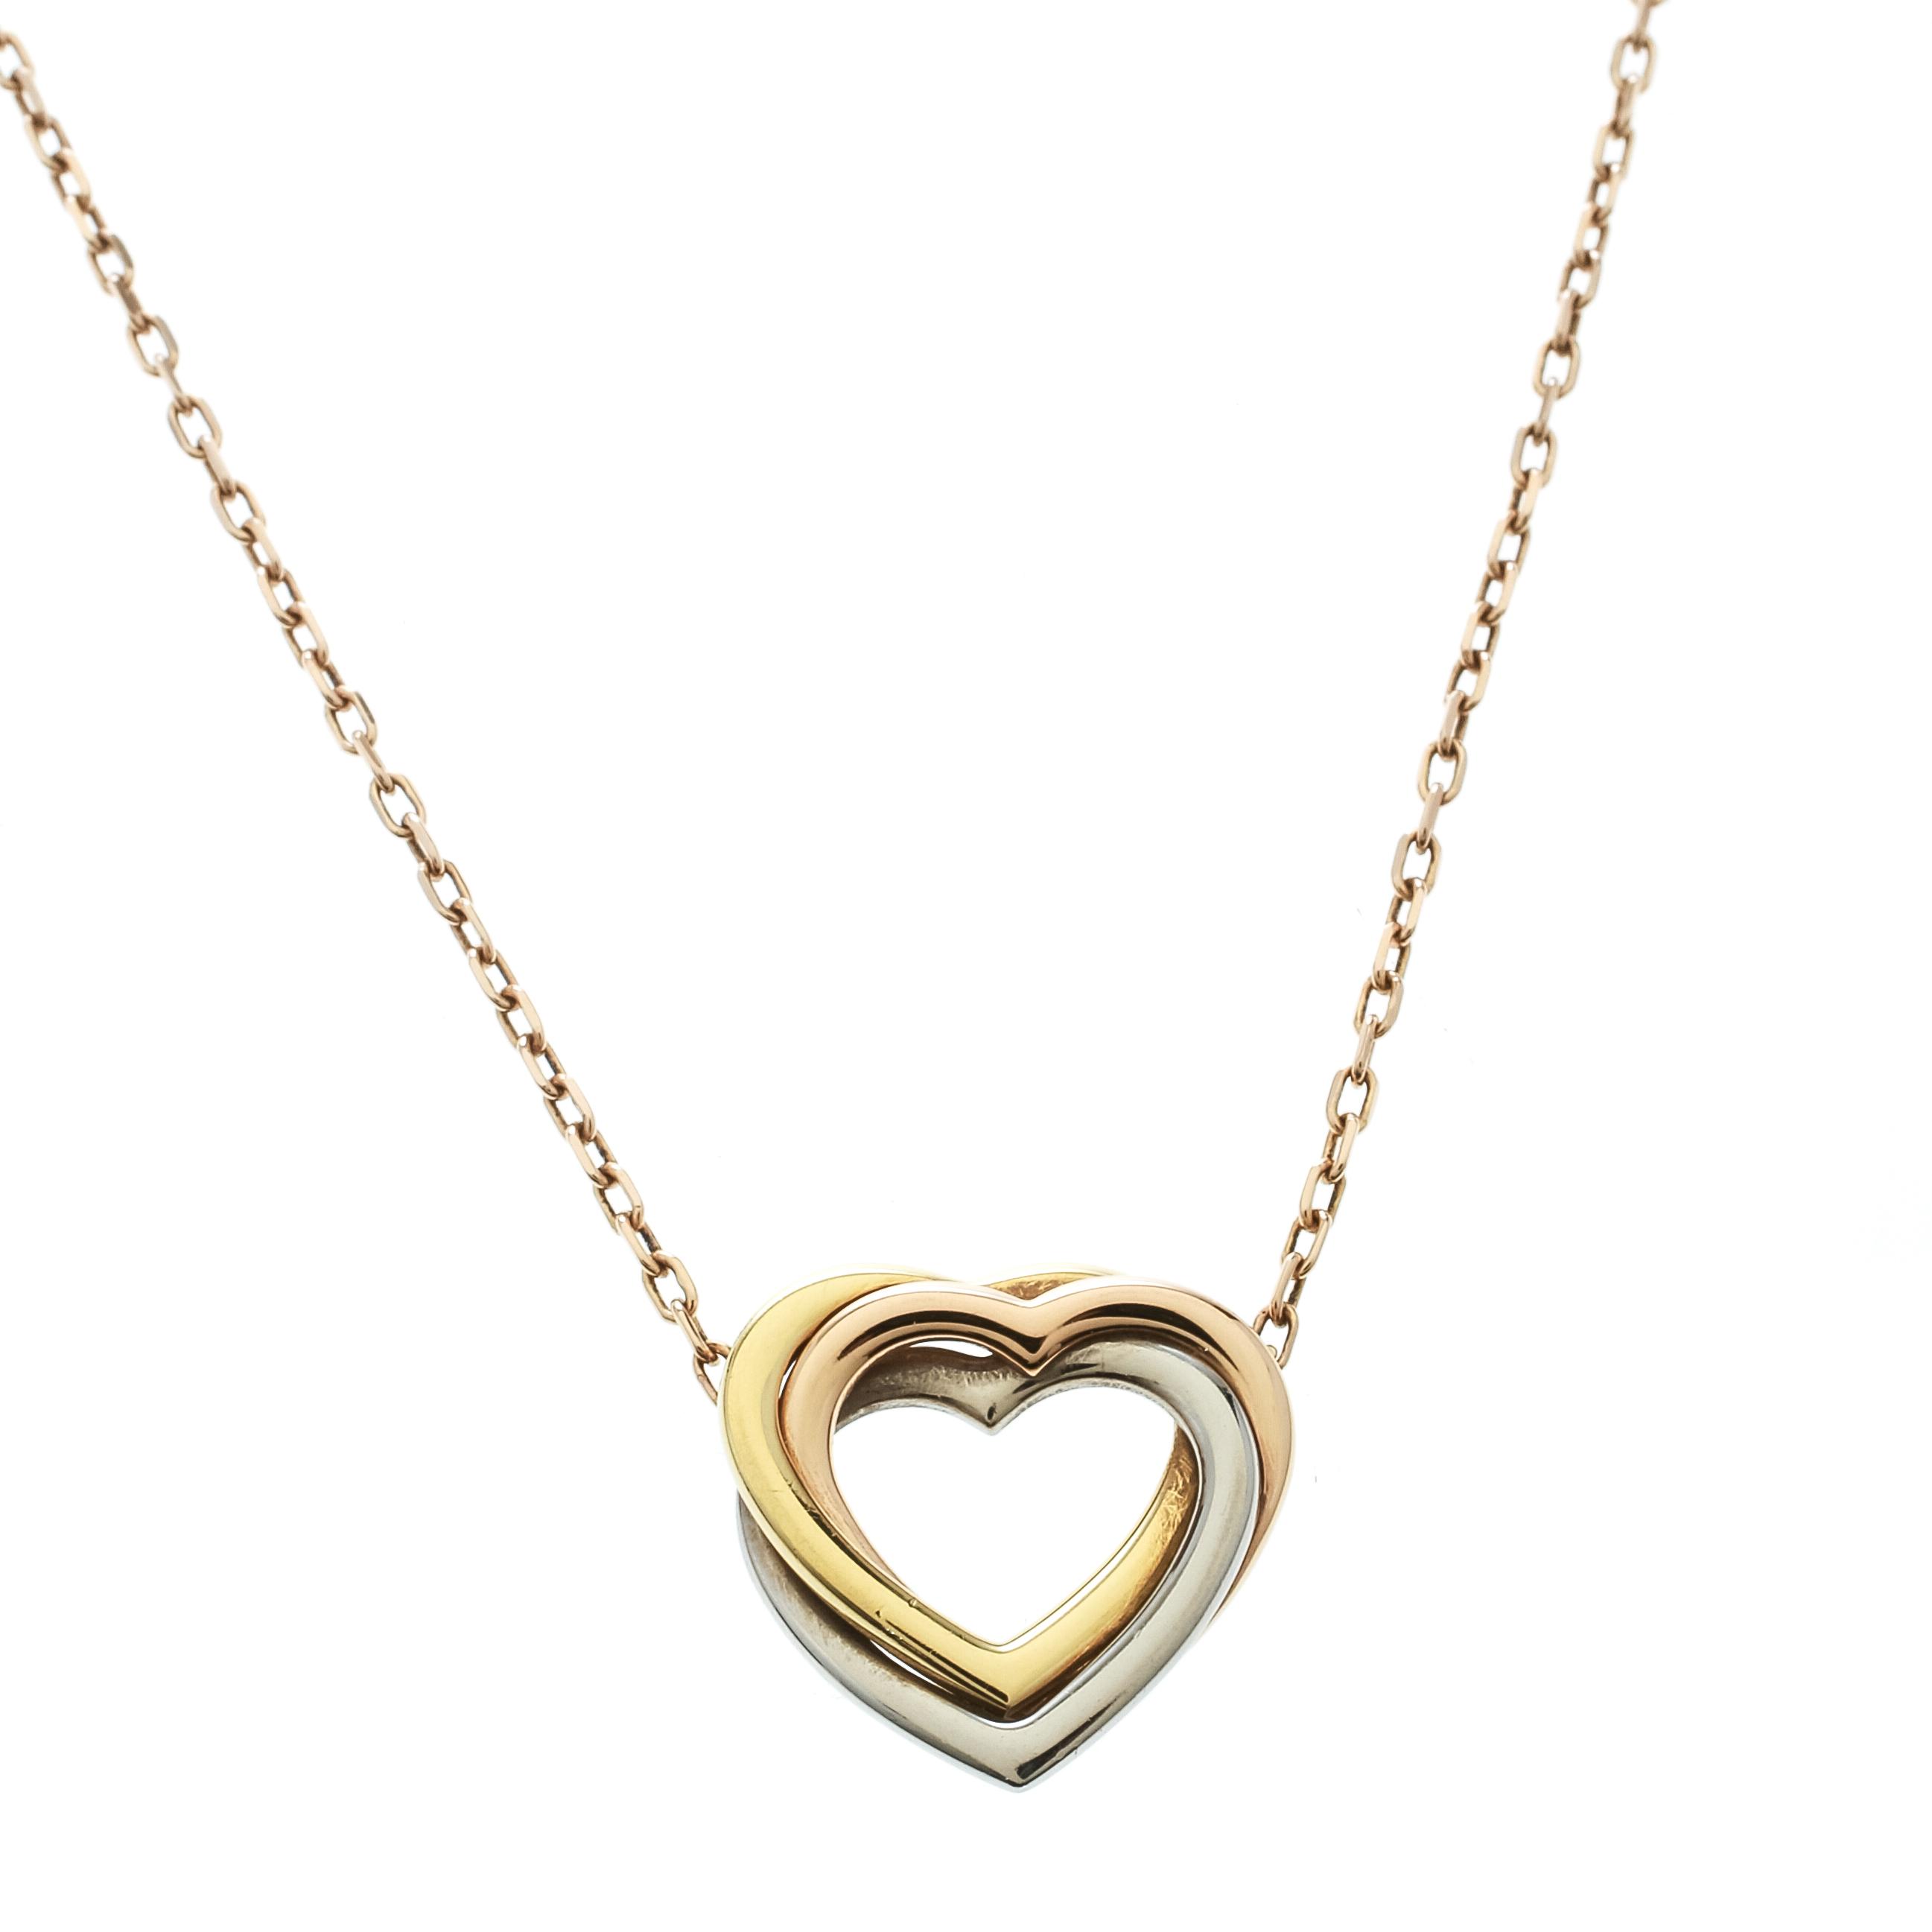 884c66f68cd04 Cartier Trinity de Cartier Heart Three Tone 18k Gold Necklace